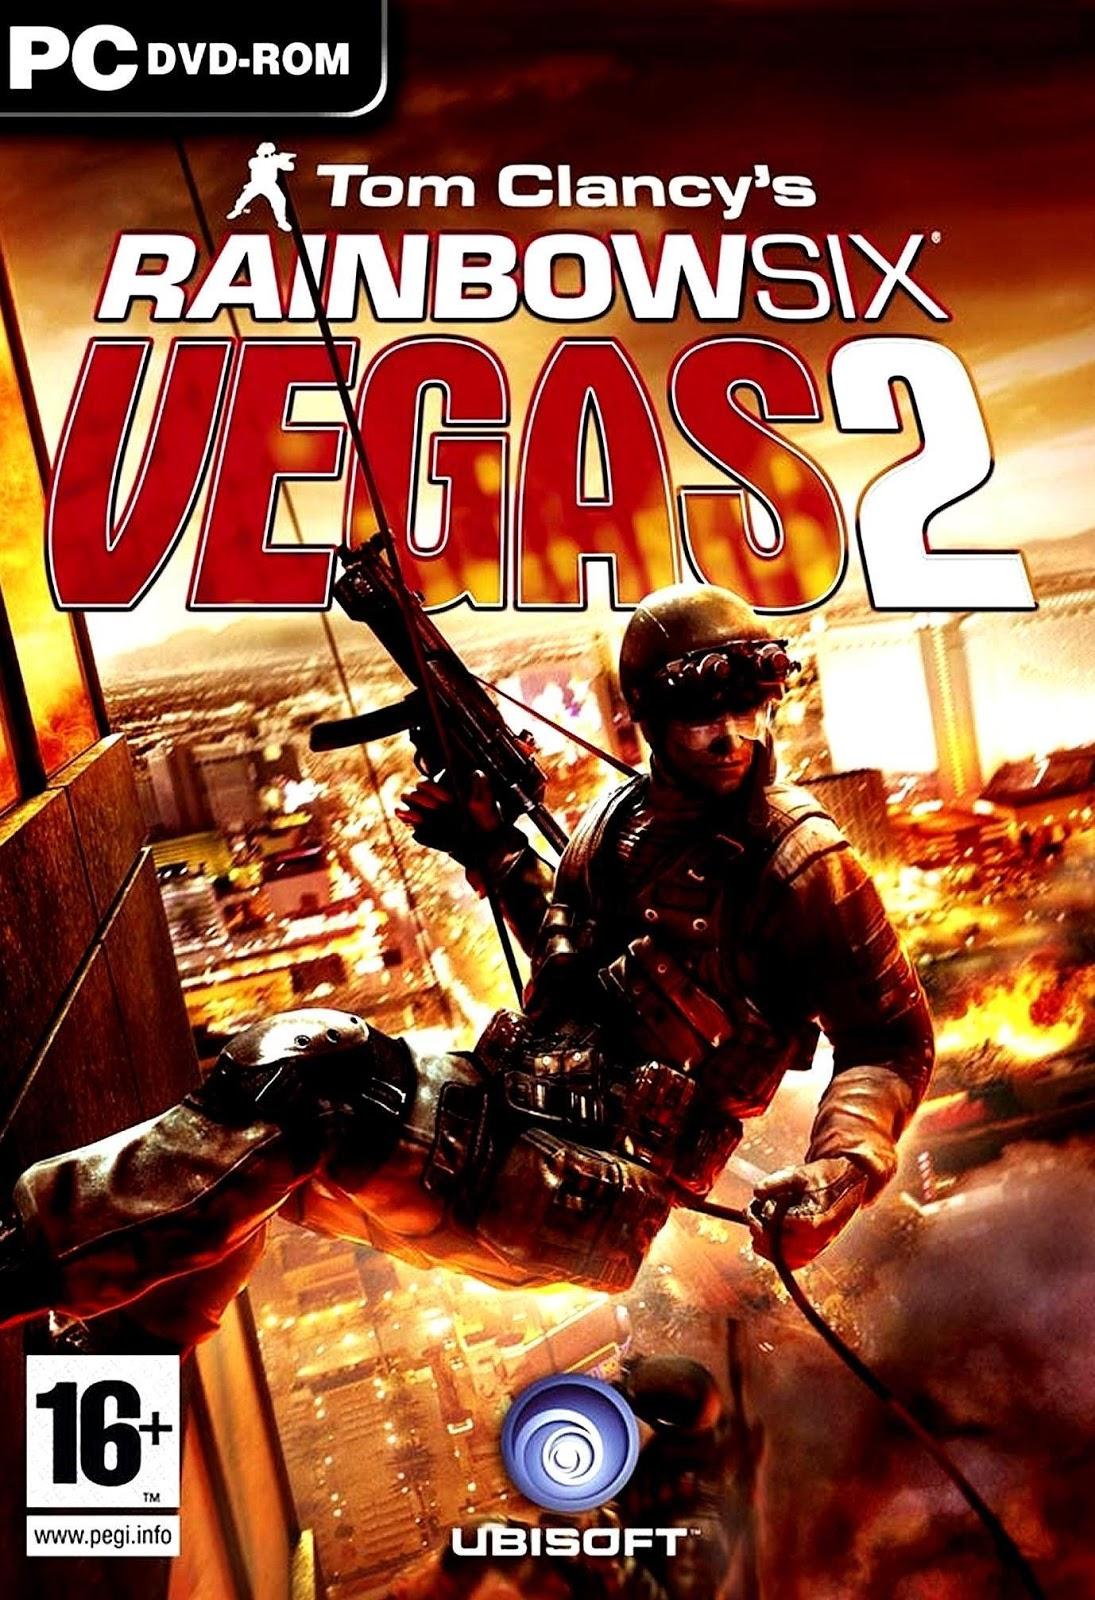 Tom Clancy's Rainbow Six Vegas Full (Single Link) 2015